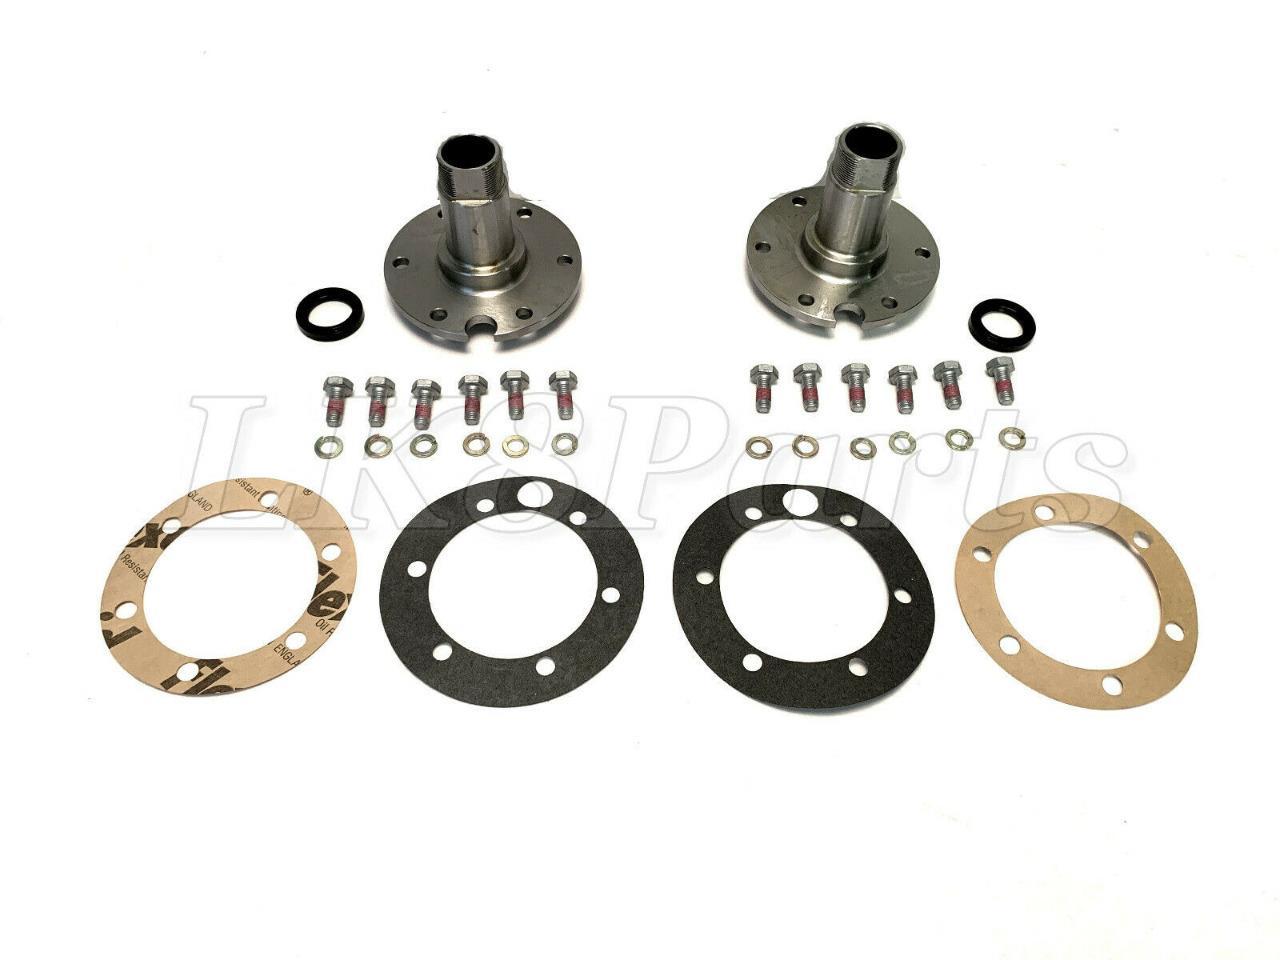 Rover Axle Repair Kit